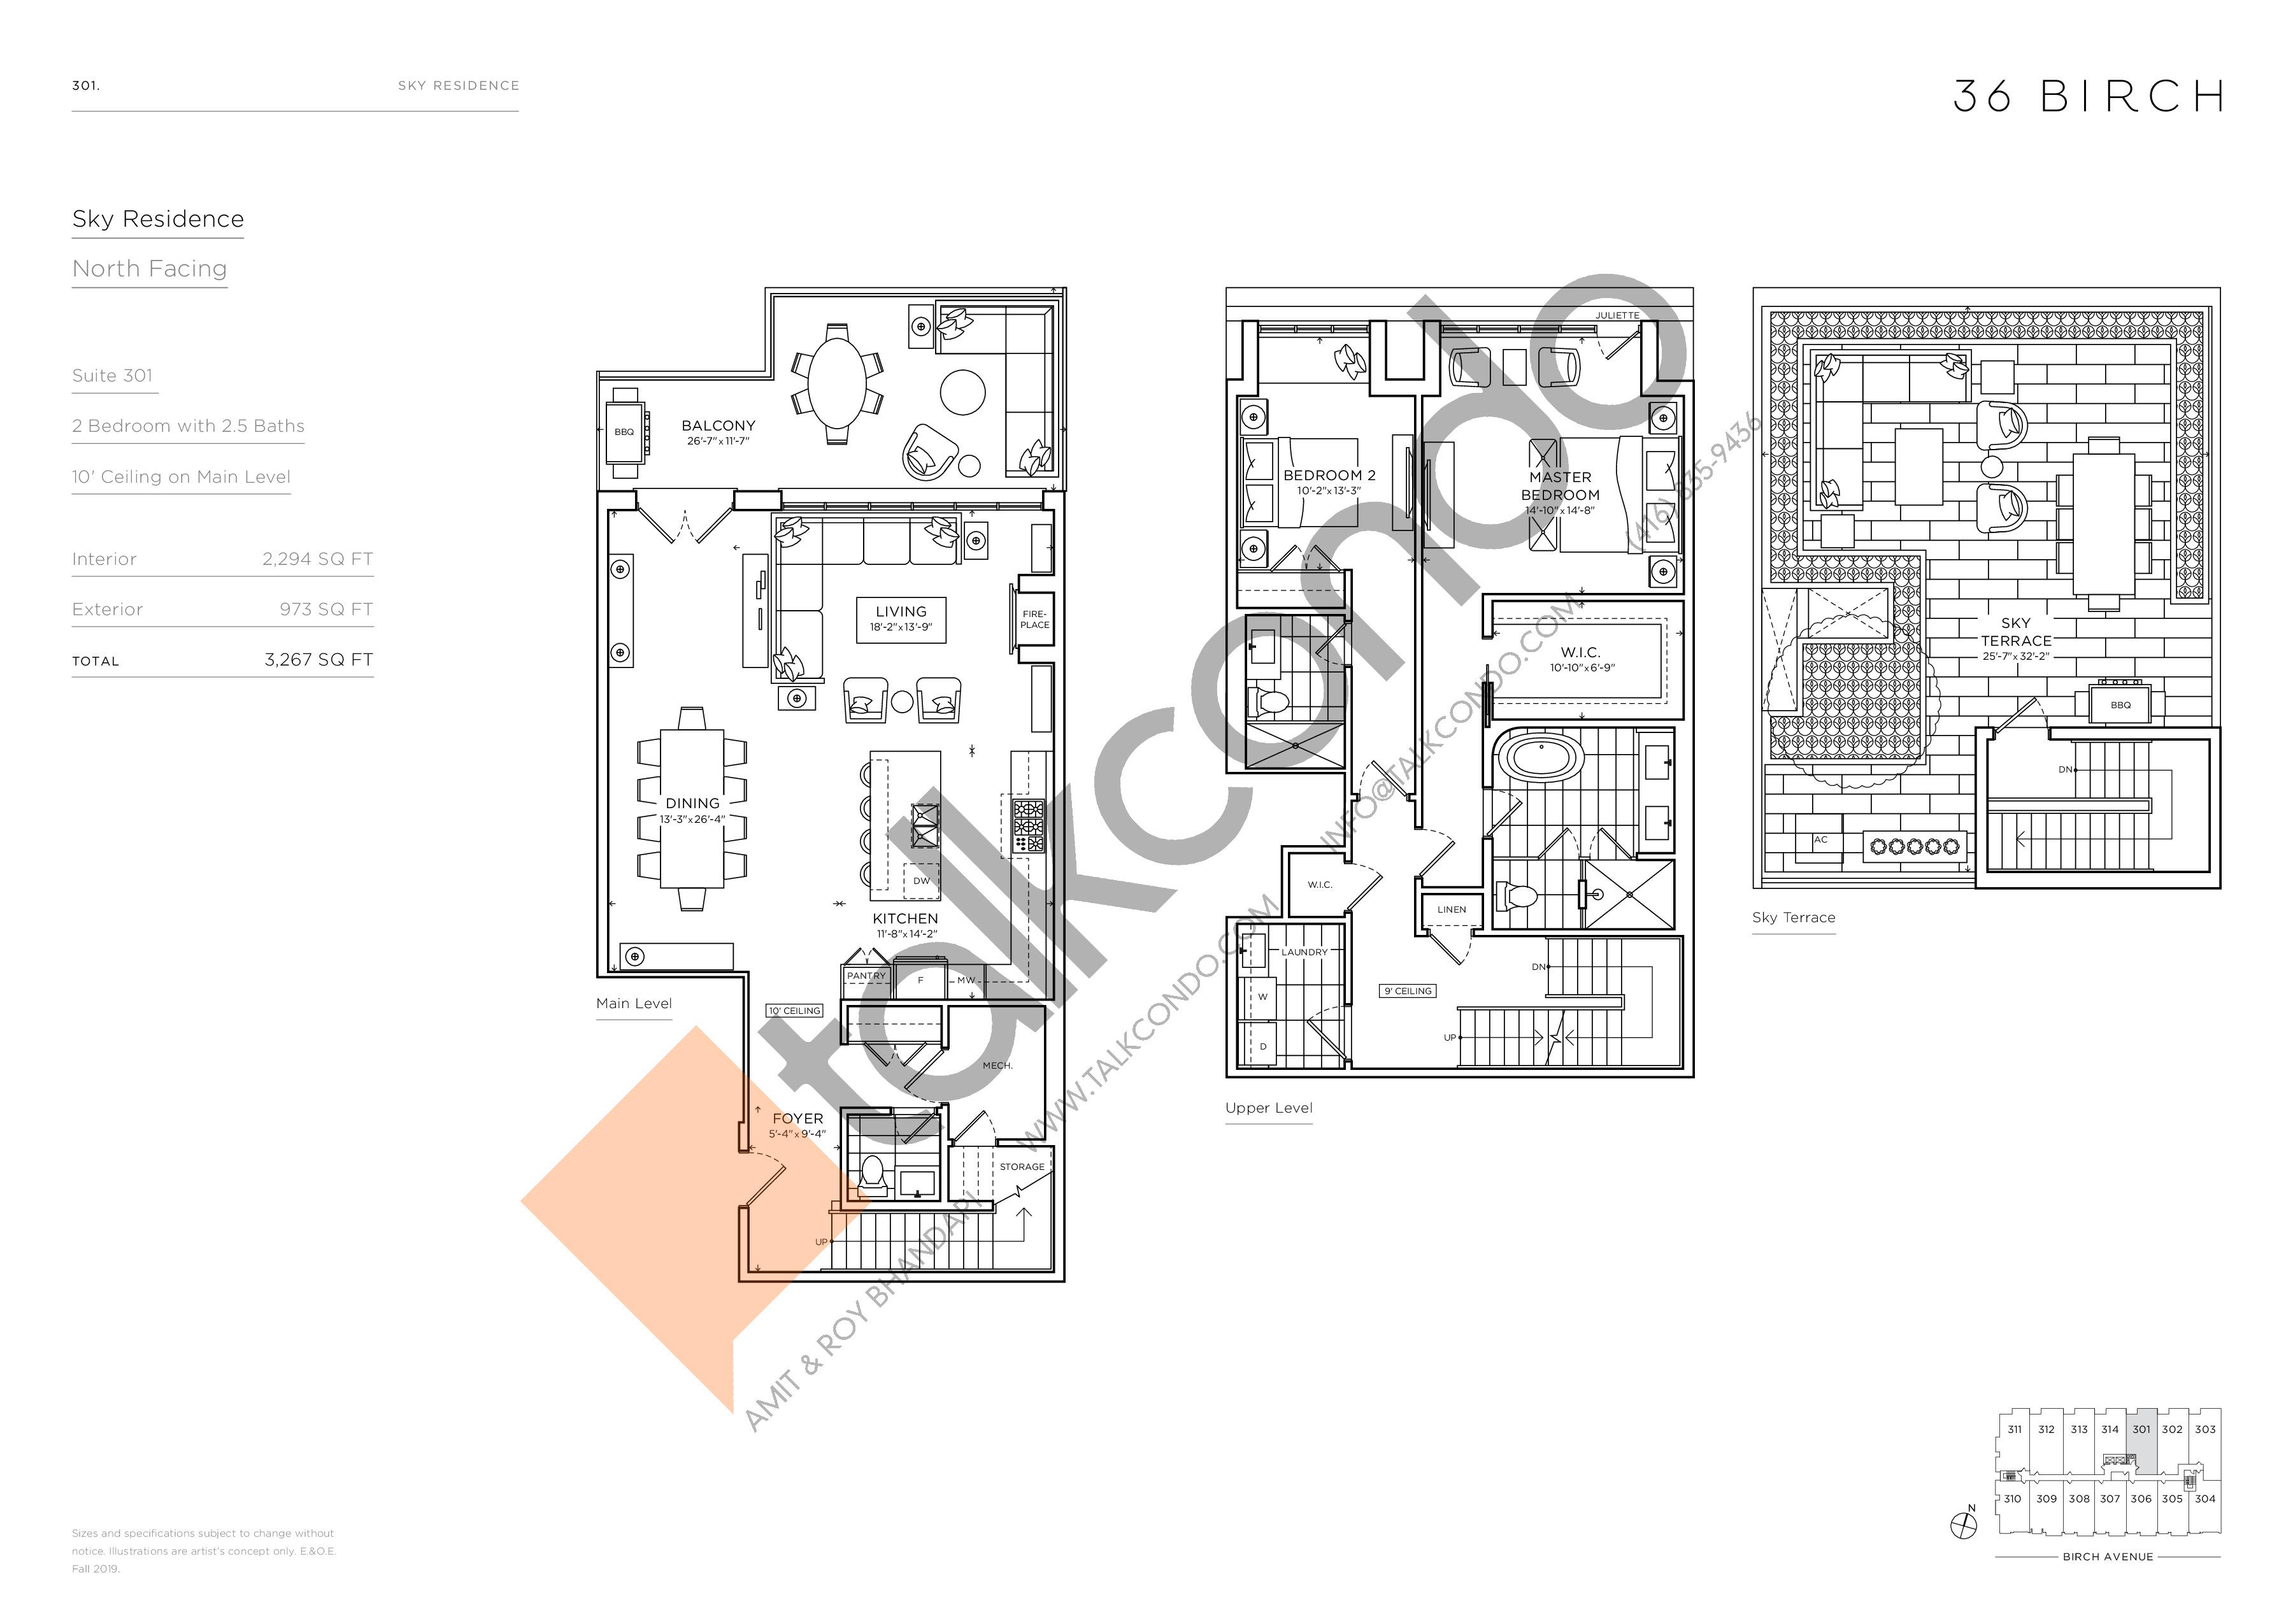 301 - Sky Residence Floor Plan at 36 Birch Condos - 2294 sq.ft